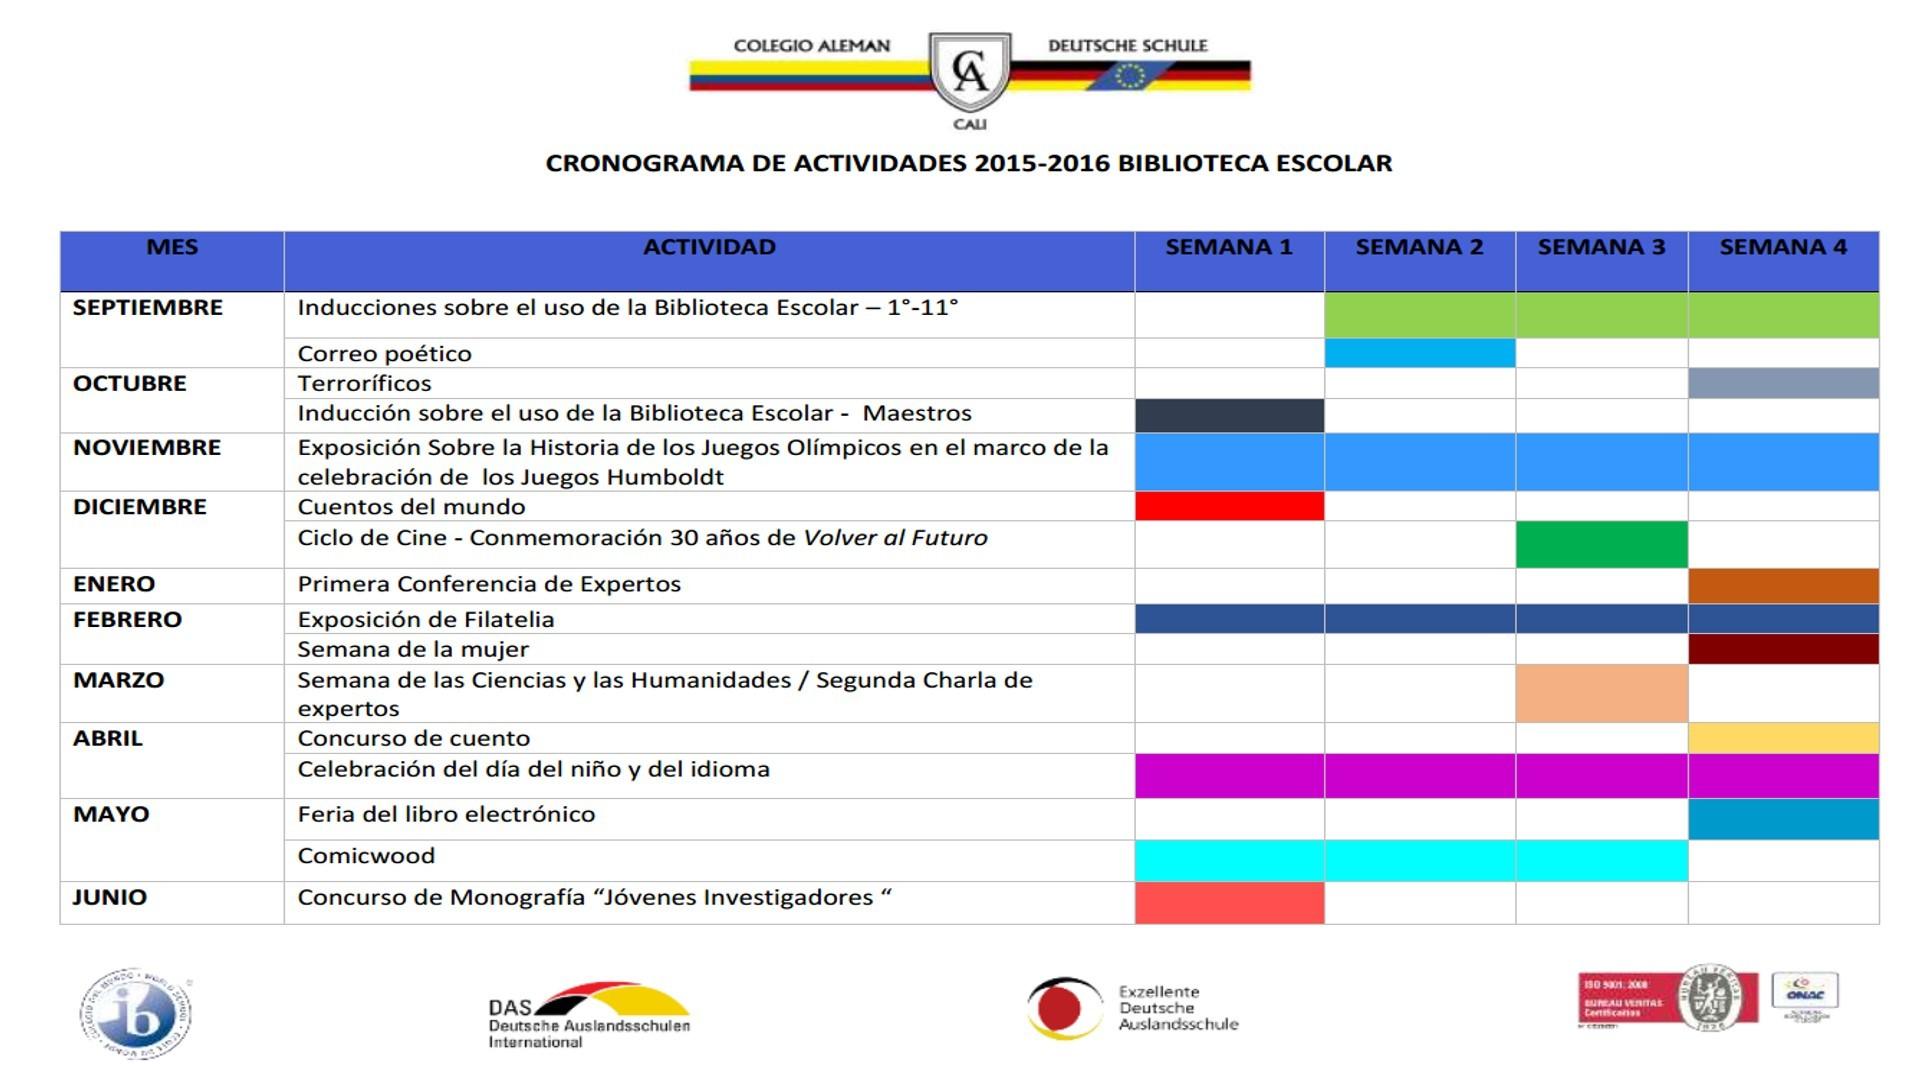 Calendario Janeiro 2020 Brasil Actual 25 Unique Calendario 2015 Of Calendario Janeiro 2020 Brasil Recientes Pnld17 Col Integralis Geografia 8º No Pages 51 100